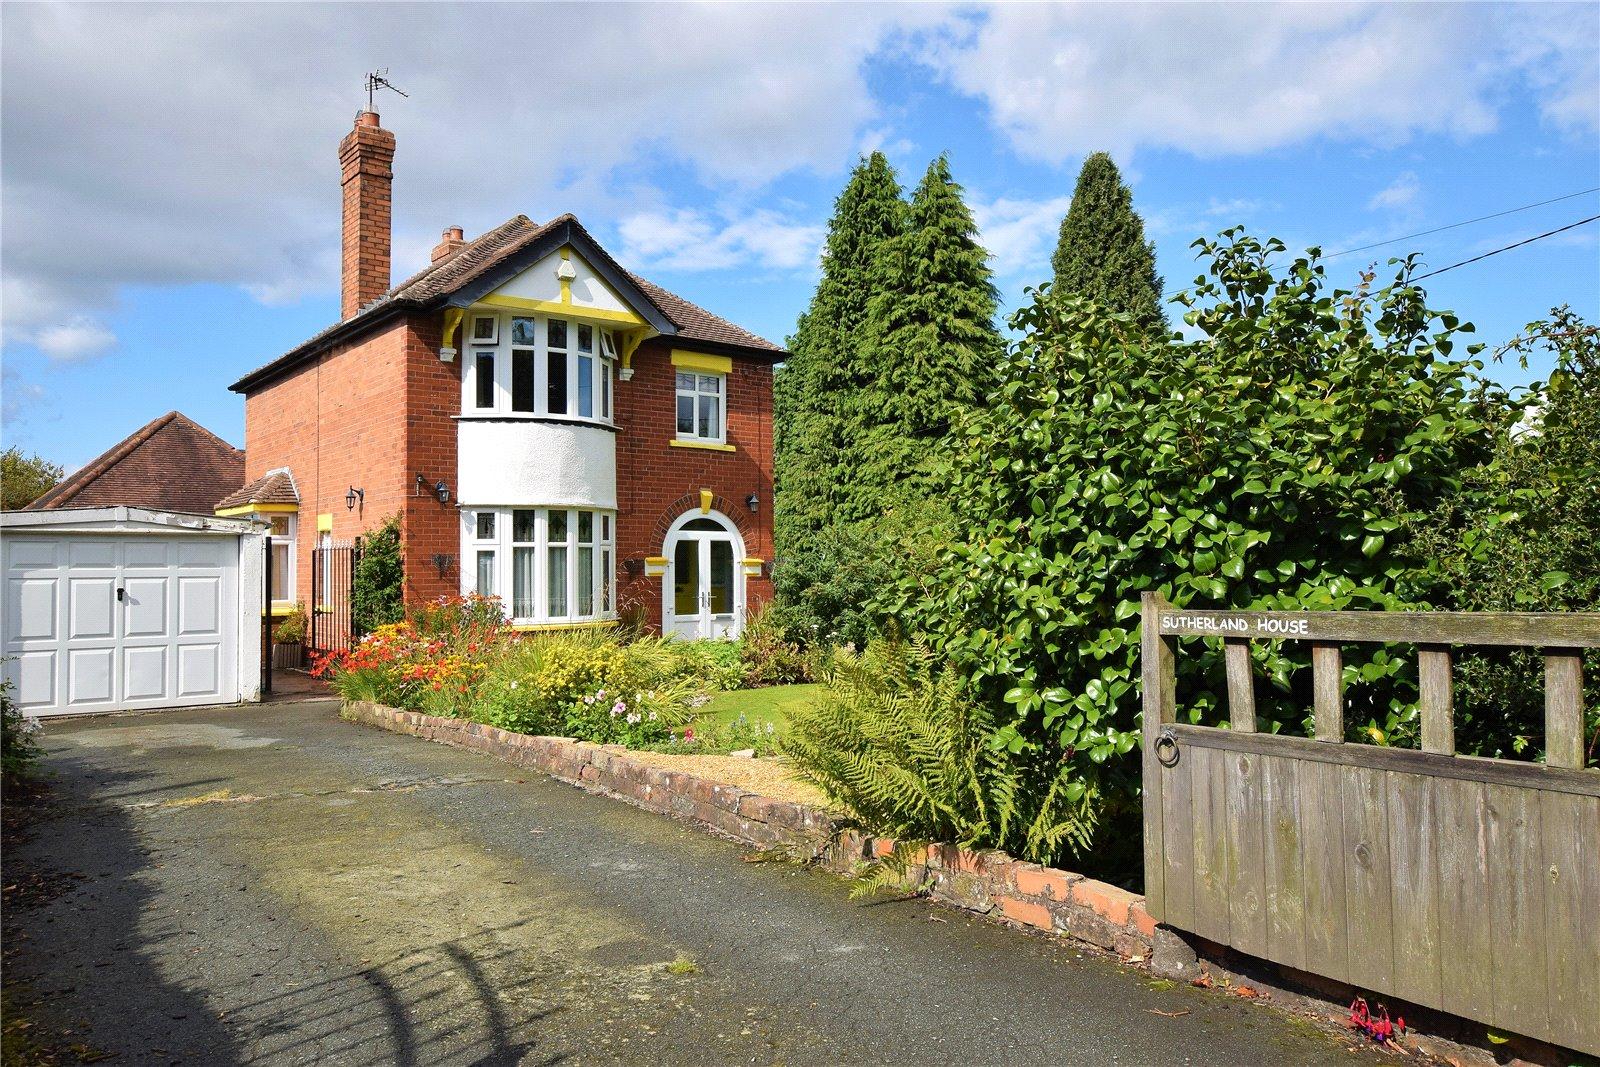 Sutherland House, Station Fields, Oakengates, Telford, Shropshire, TF2